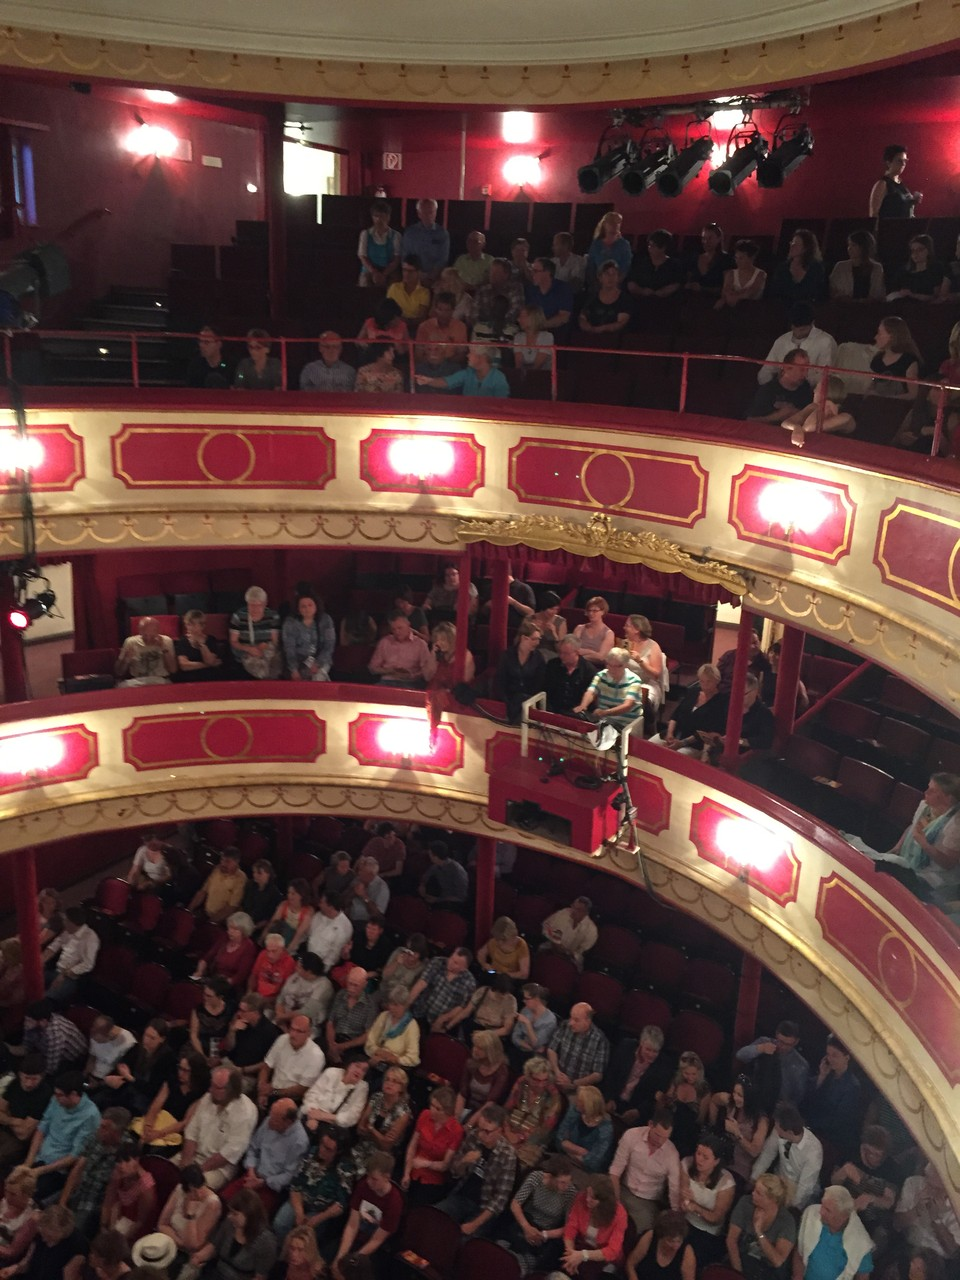 St. Pauli Theater von innen